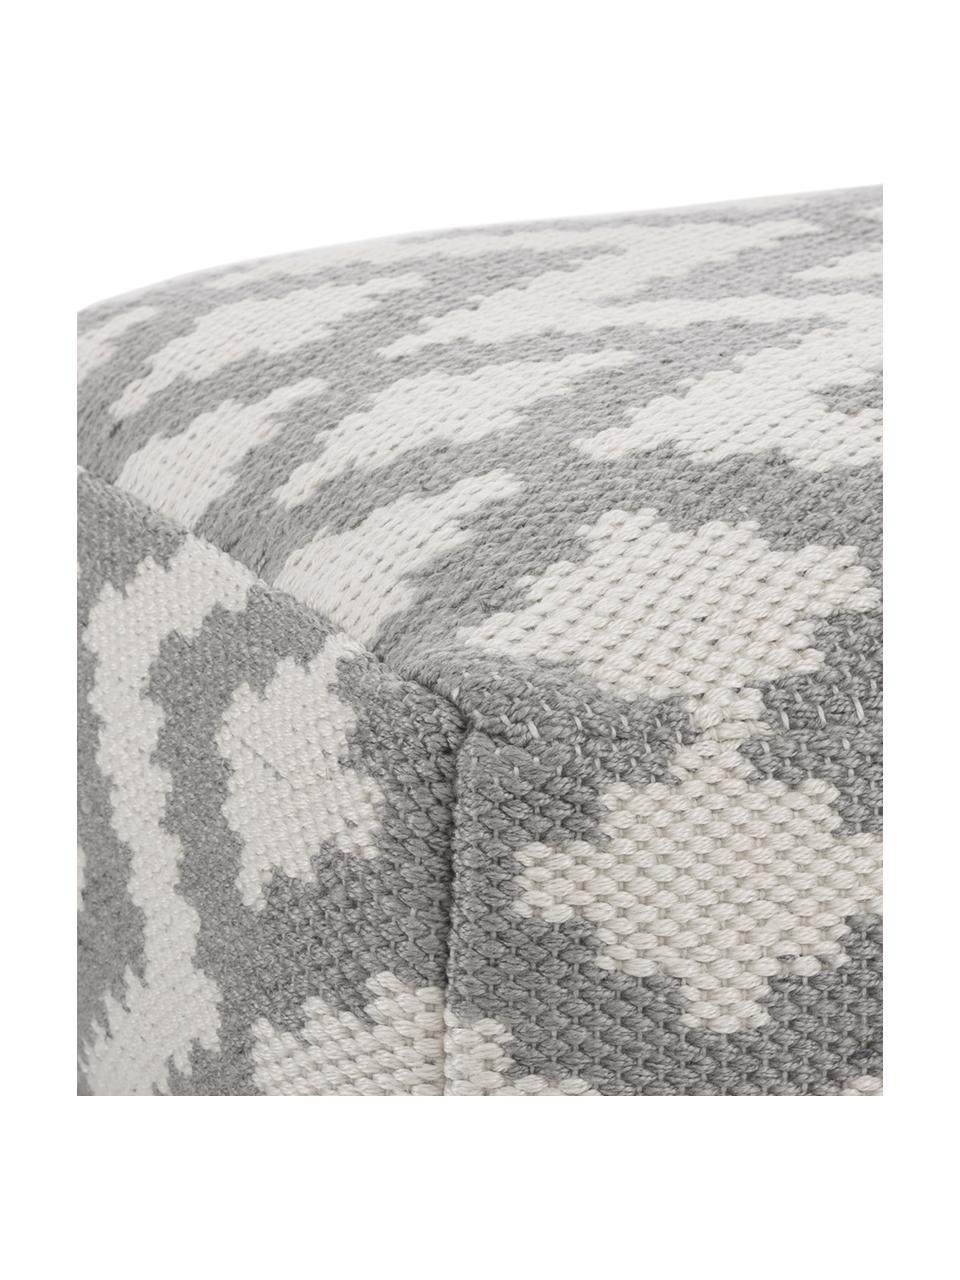 Cuscino da pavimento tessuto a mano da interno-esterno Napua, Rivestimento: 100% poliestere riciclato, Grigio, ecru, Larg. 63 x Alt. 30 cm